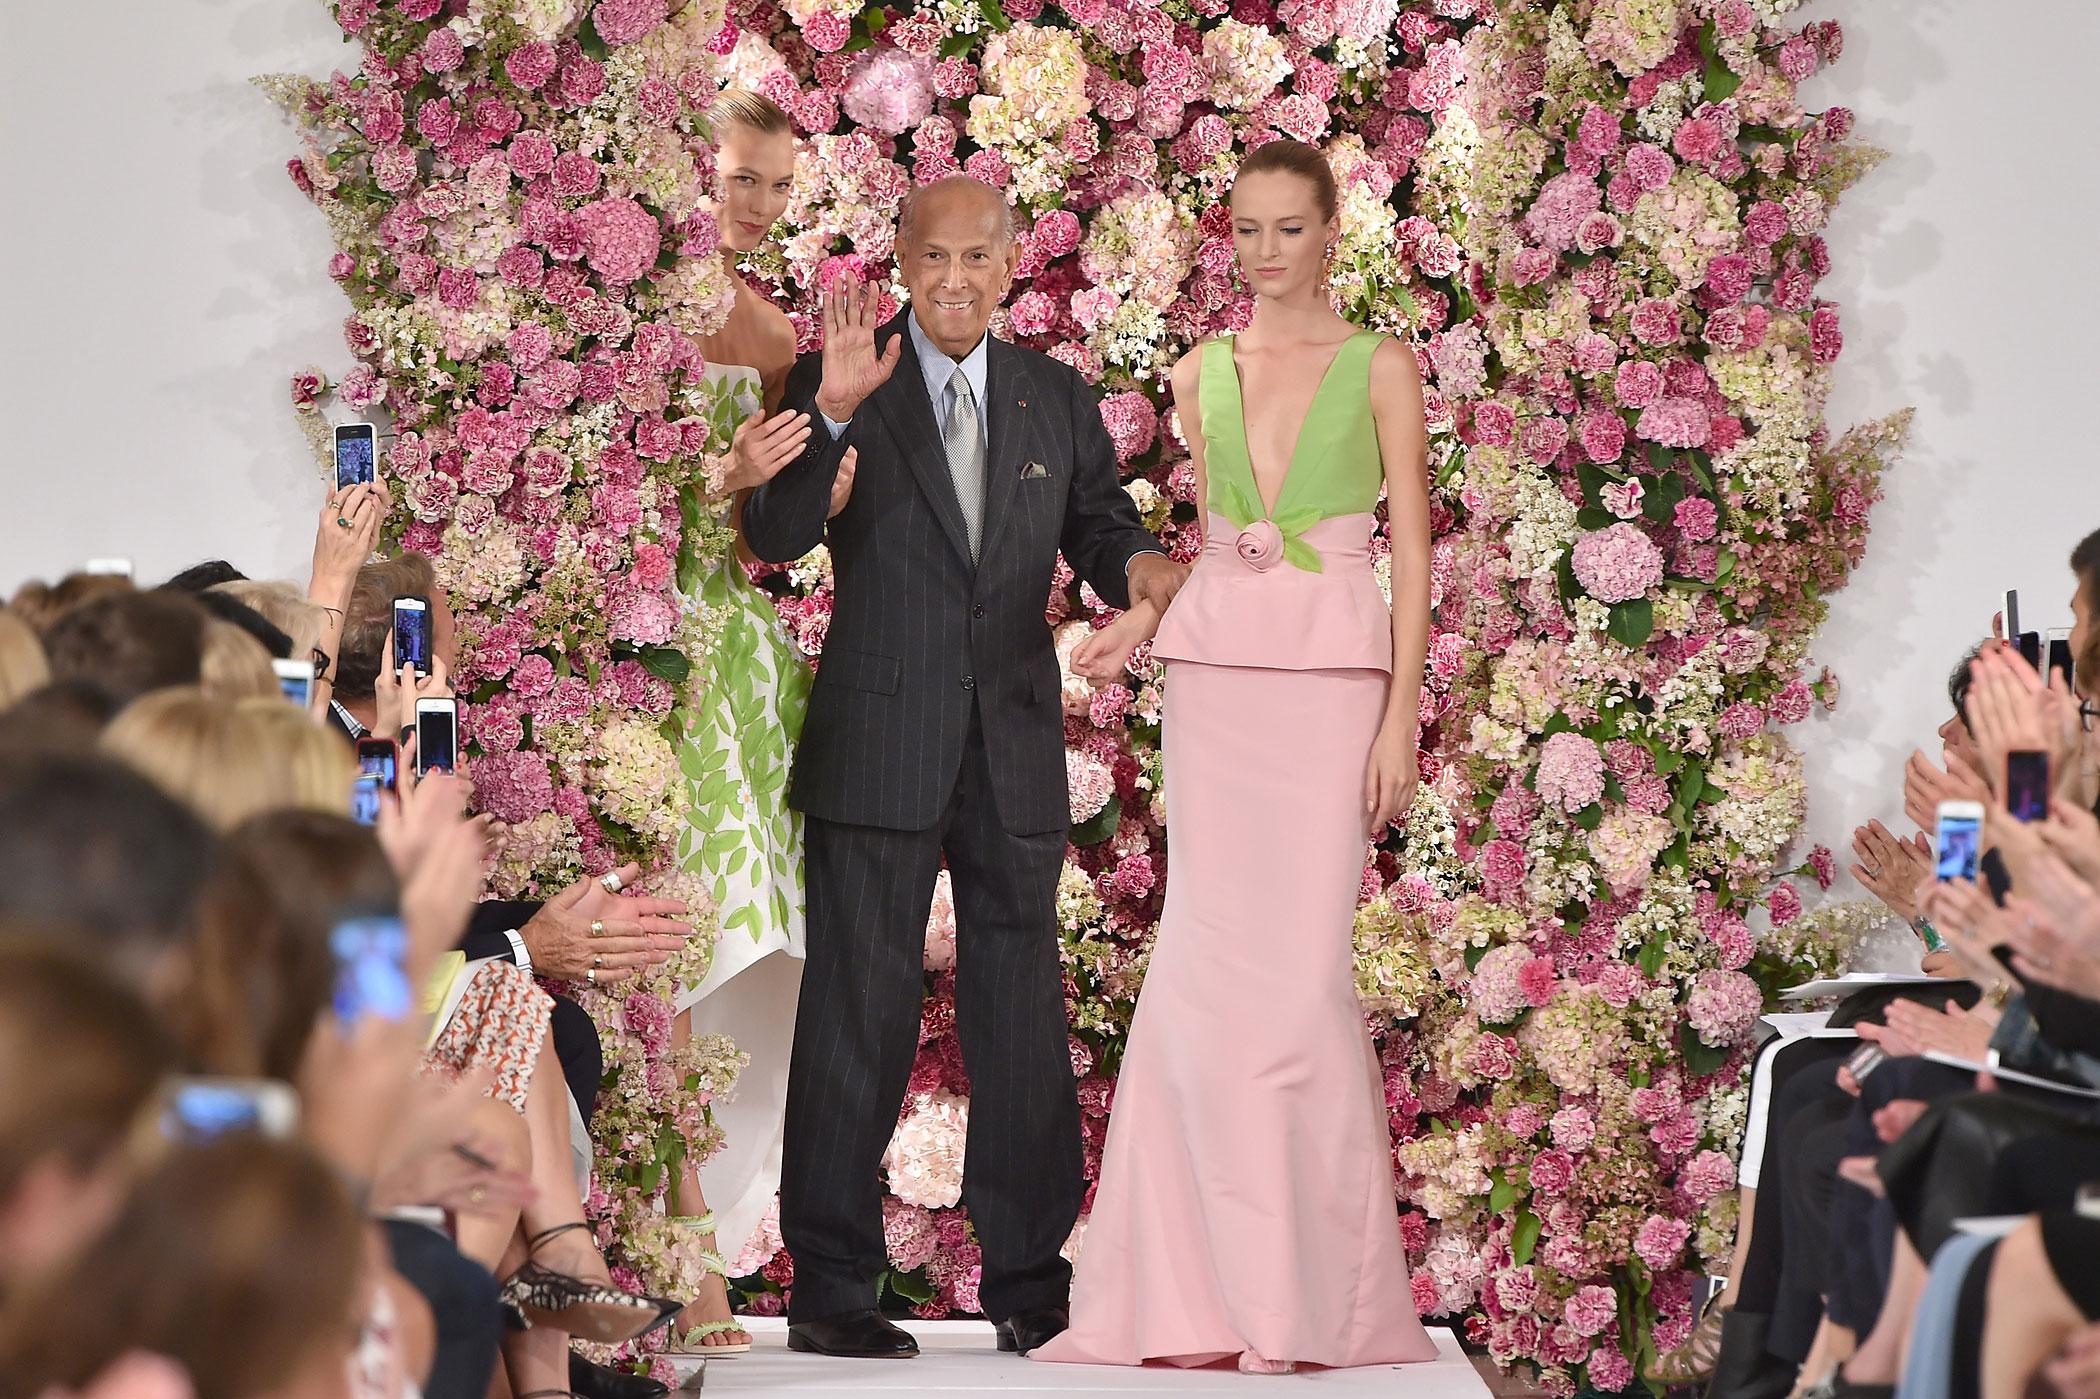 Oscar de la Renta and model Karlie Kloss, left, walk the runway at the Oscar De La Renta fashion show during Mercedes-Benz Fashion Week Spring 2015 on September 9, 2014 in New York City.